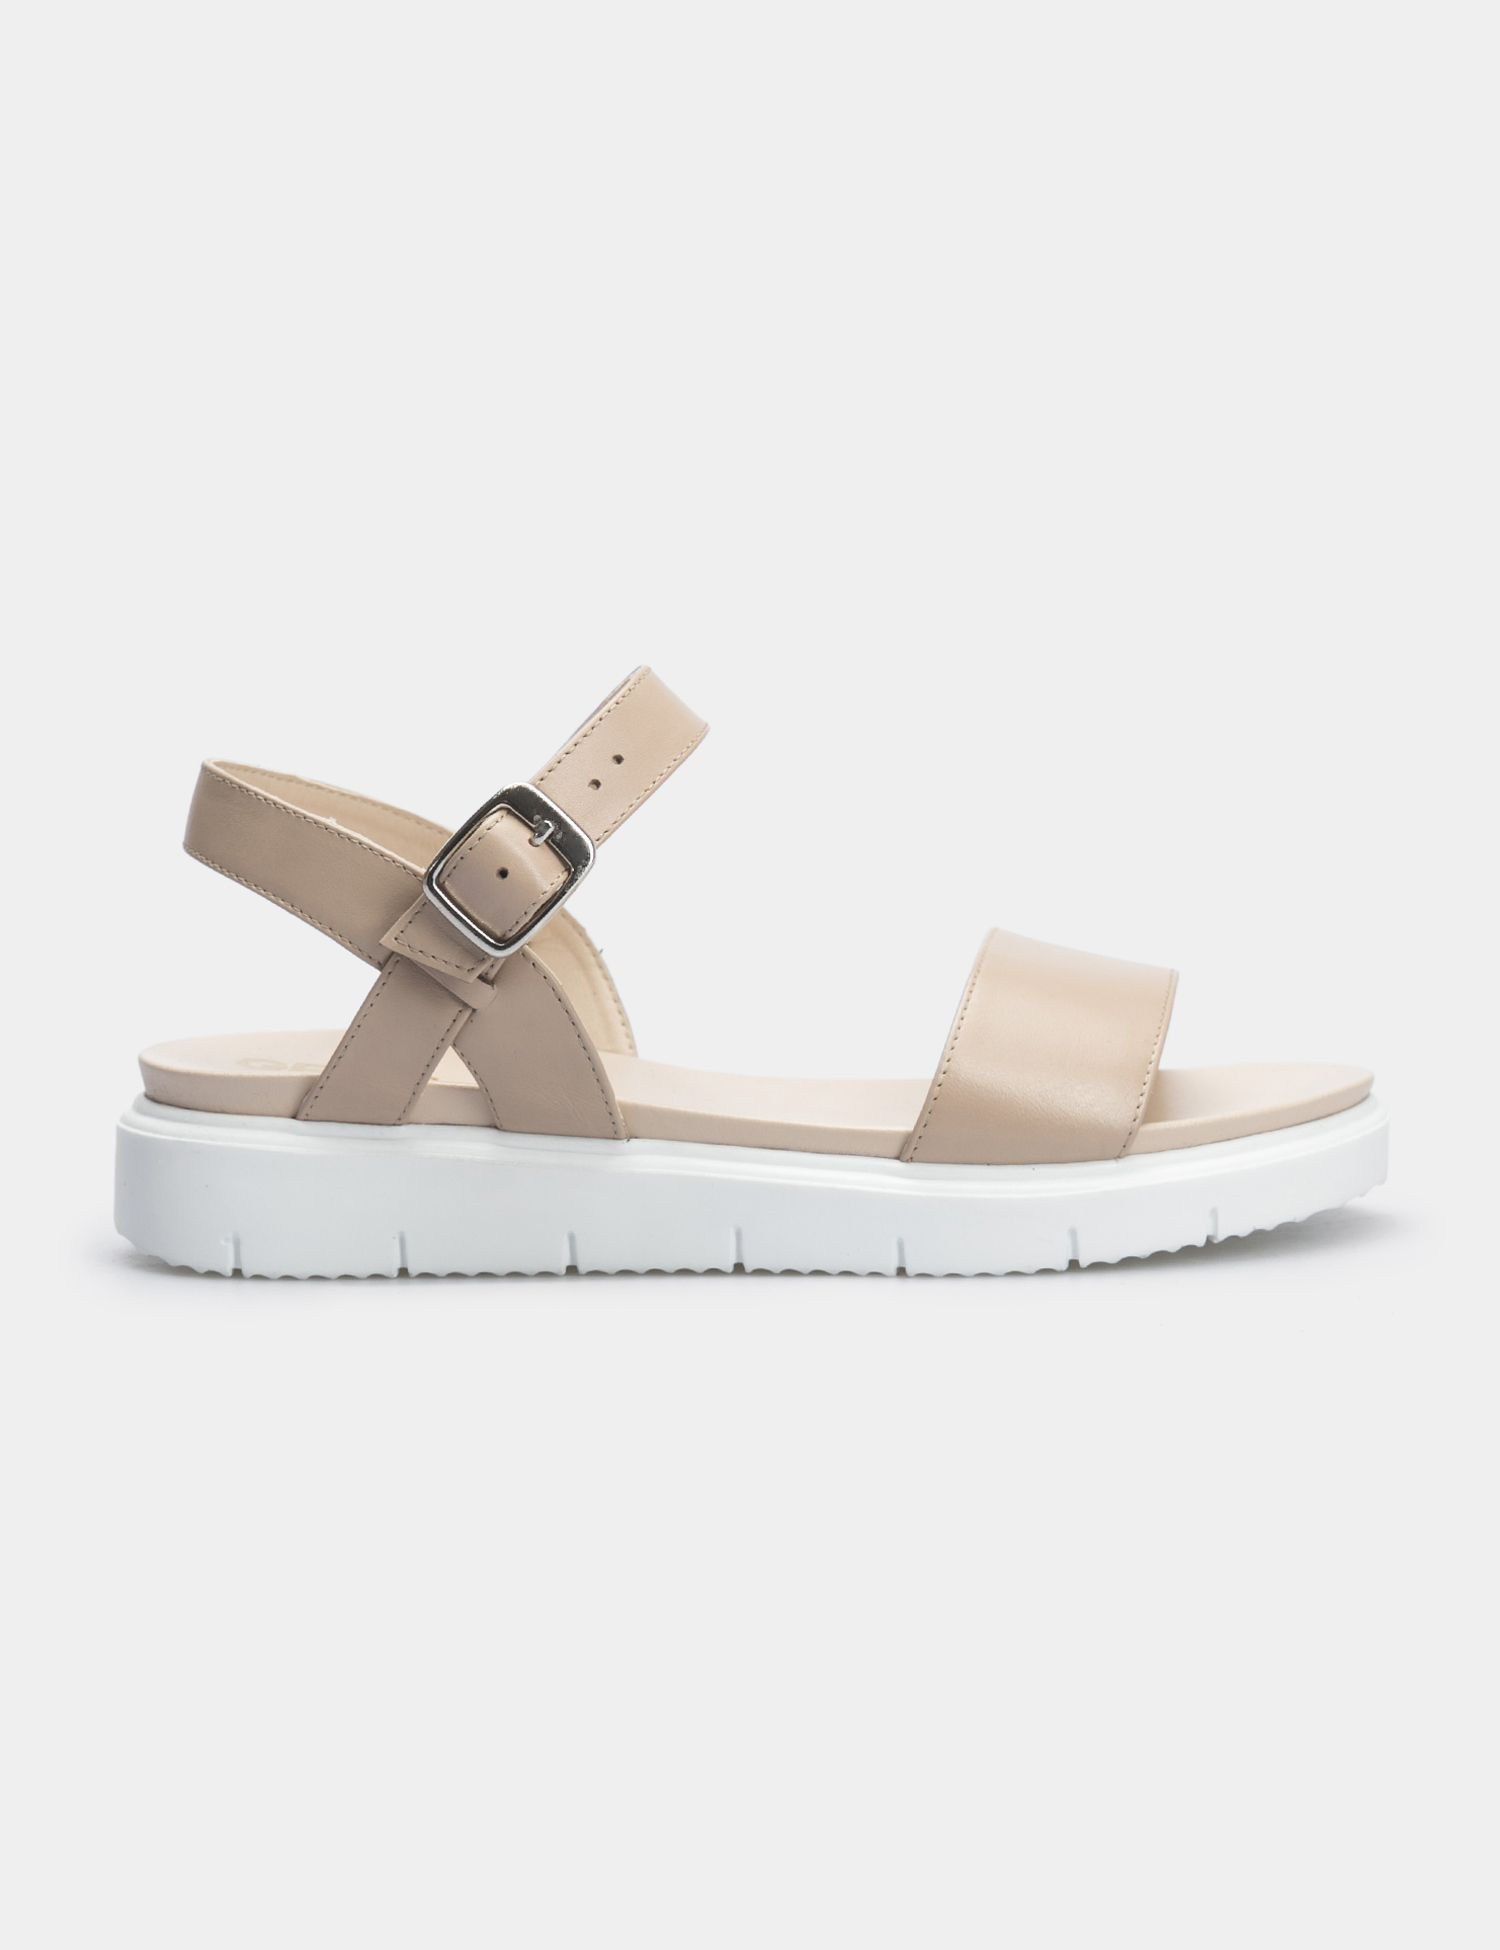 Сандалии женские Сандали 94987416-1 бежевая кожа 94987416-1 размерная сетка обуви, 2017